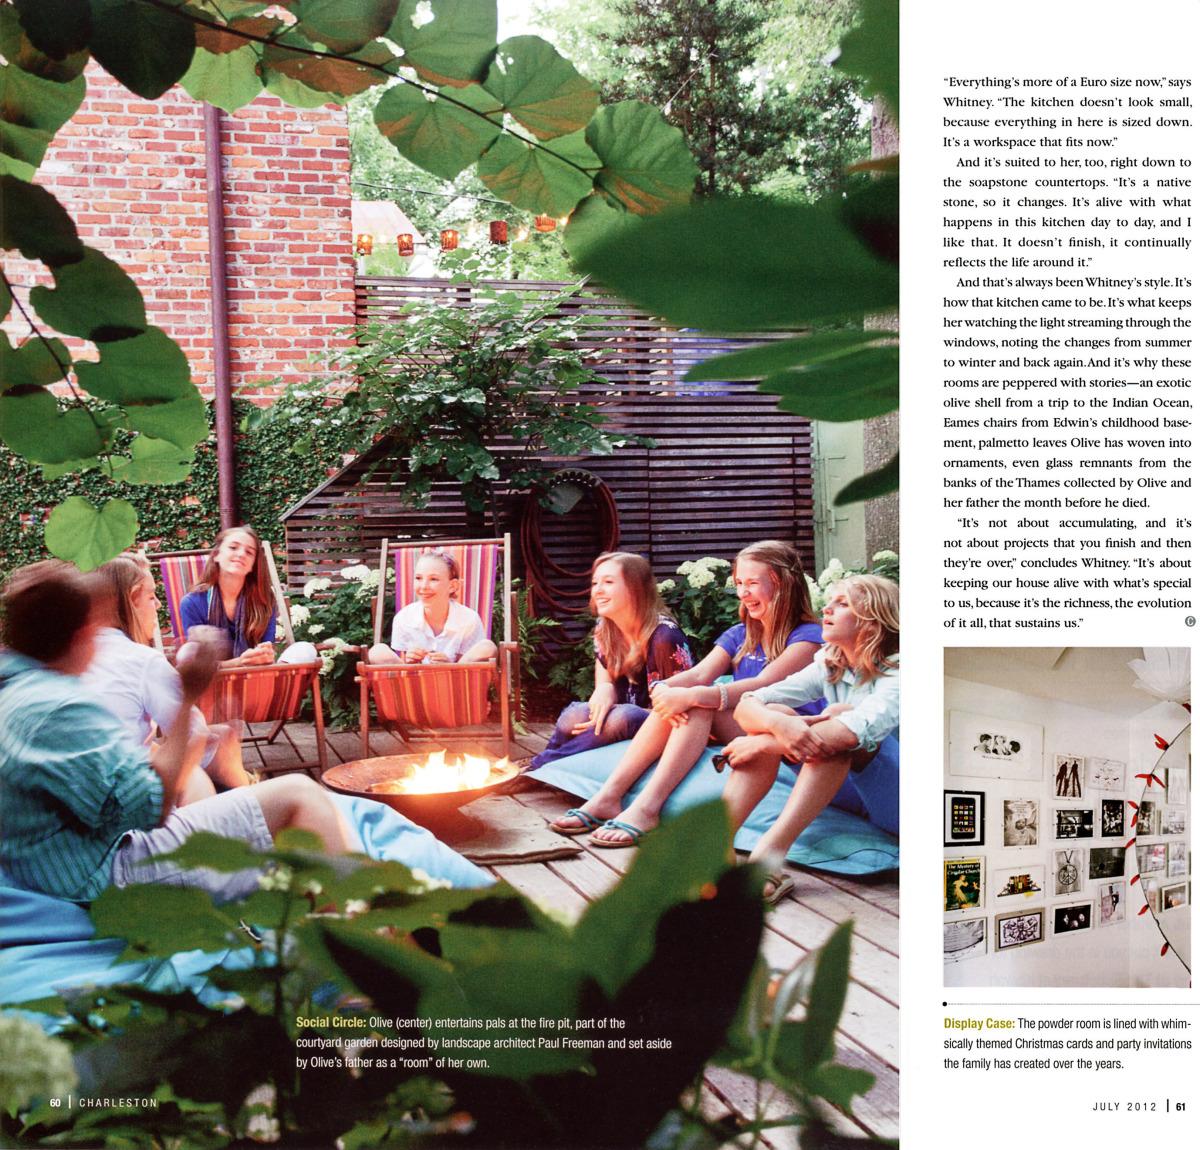 charleston-july-2012-60-61.jpg